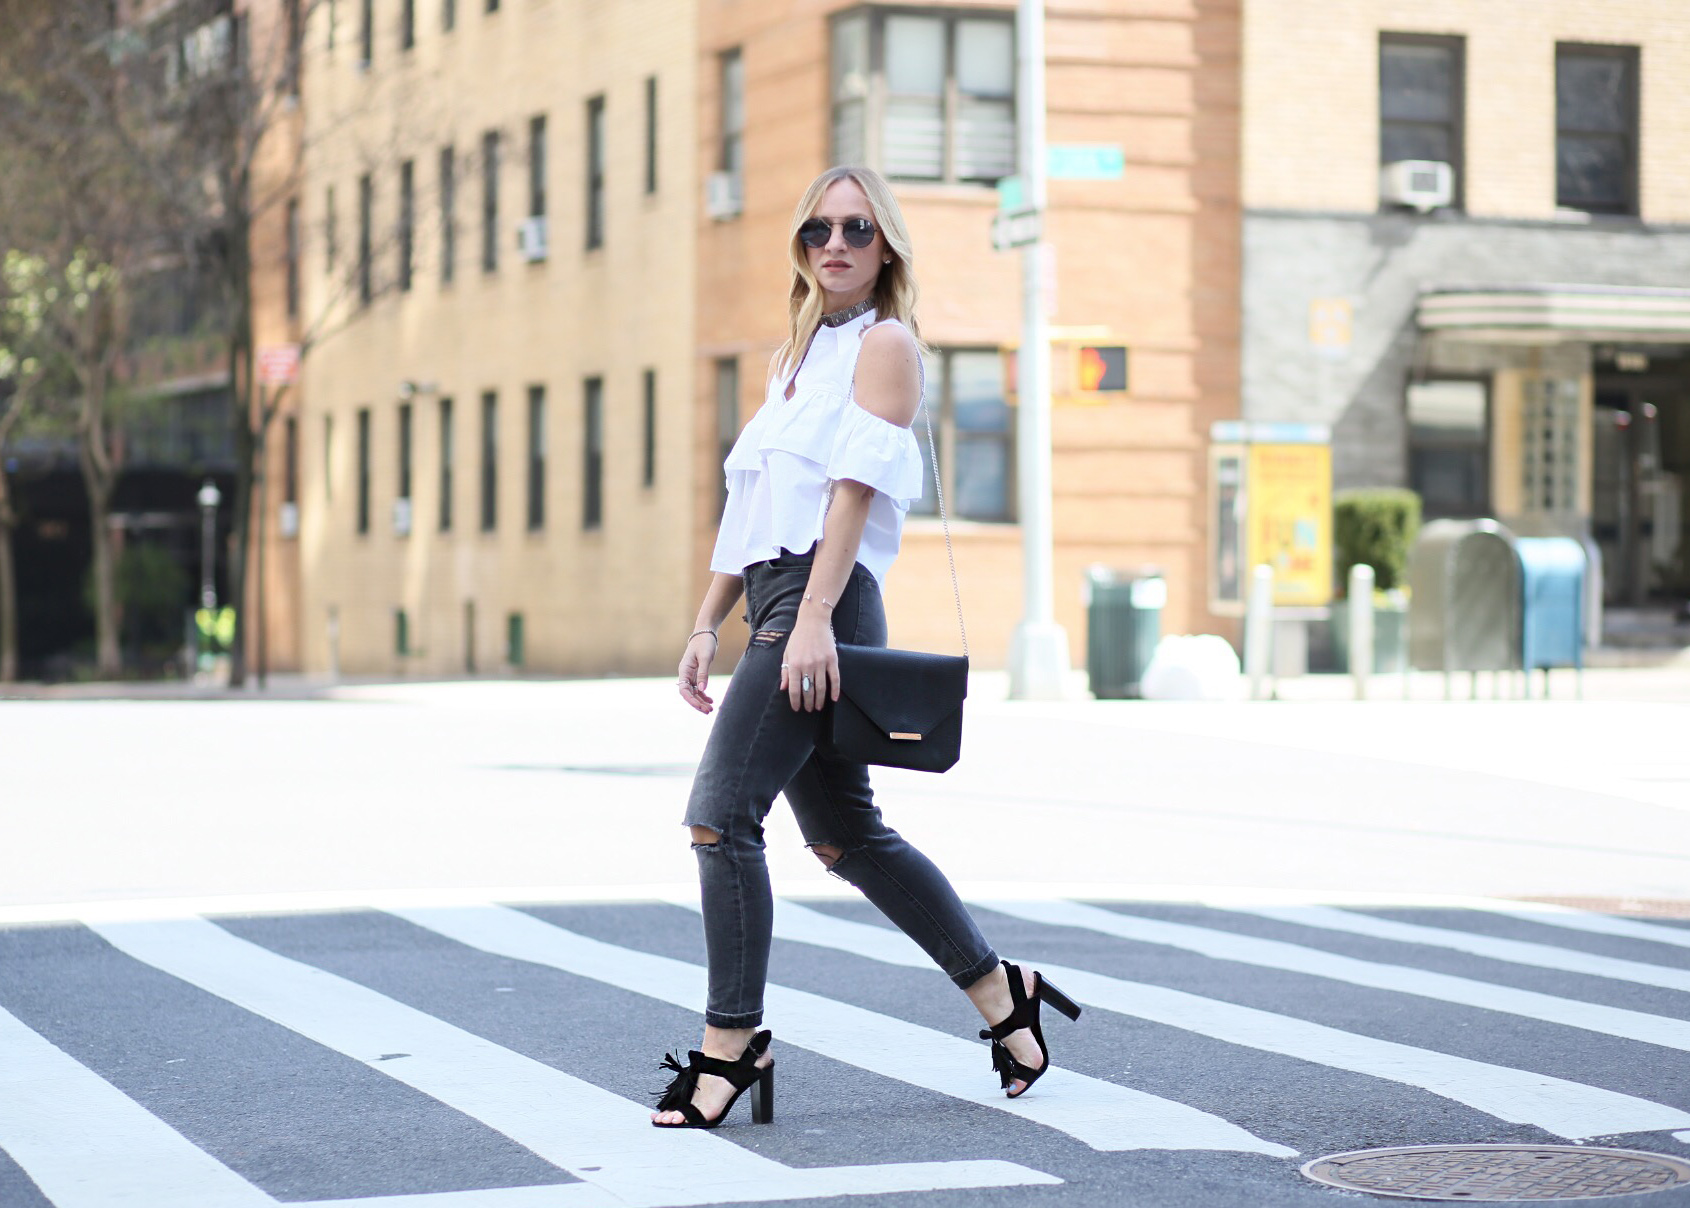 black heeled sandals with tassel